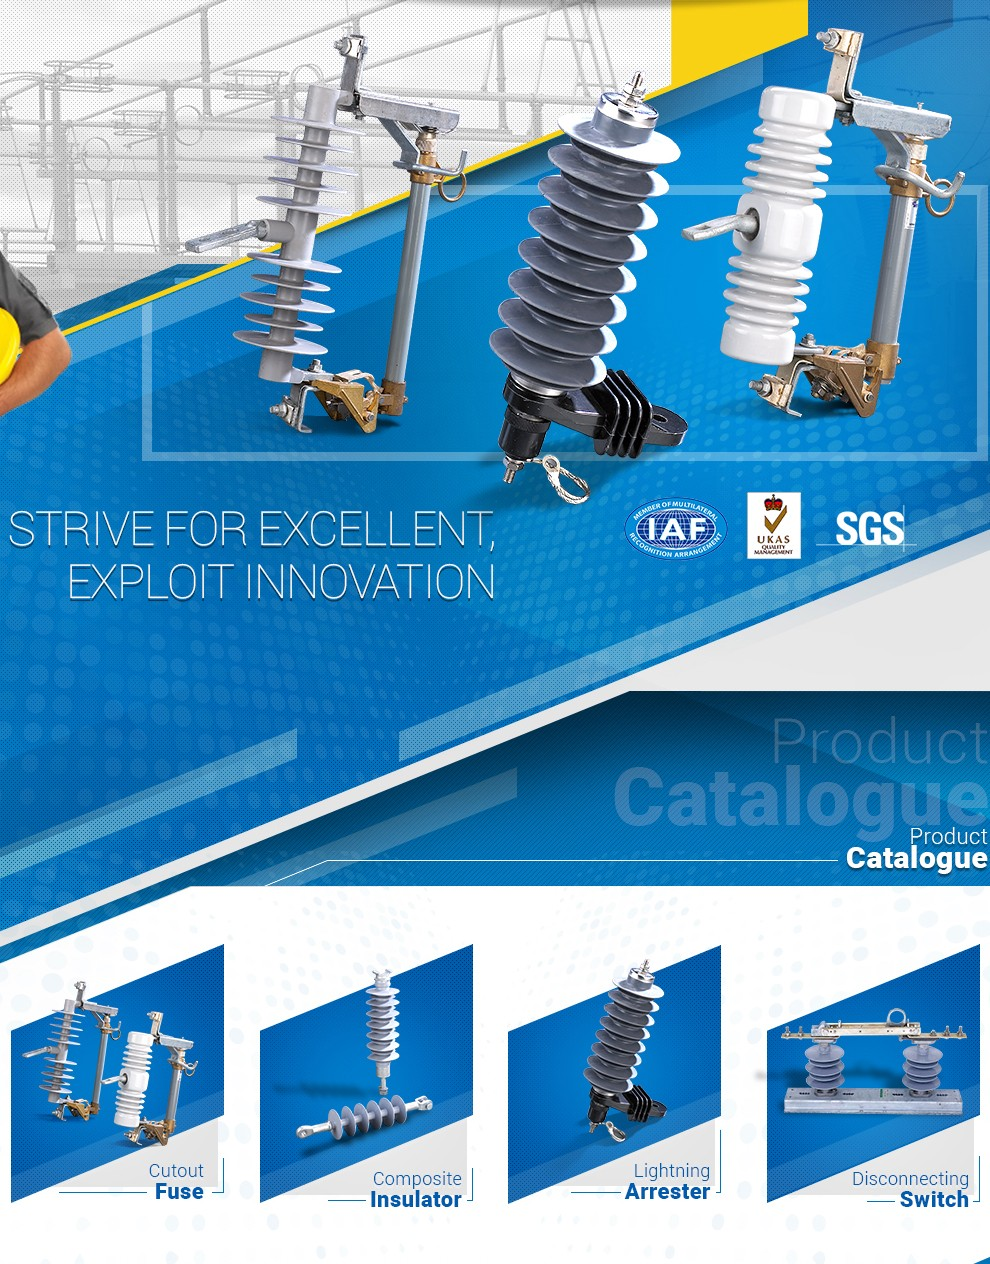 Zhejiang Meto Electrical: New Product High Voltage Building 11kv Lightning Arrester